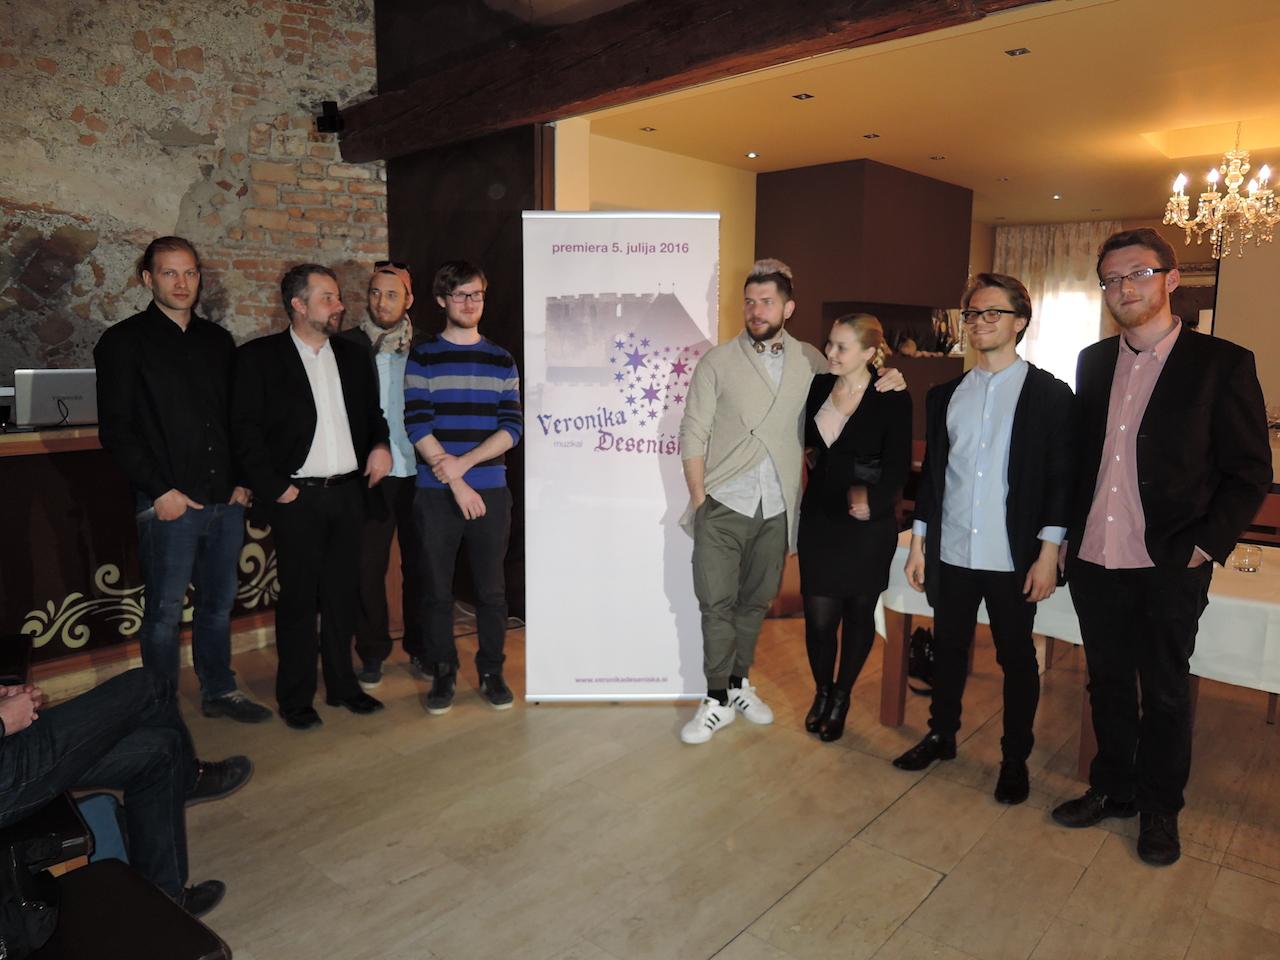 Ekipa na tiskovni konferenci